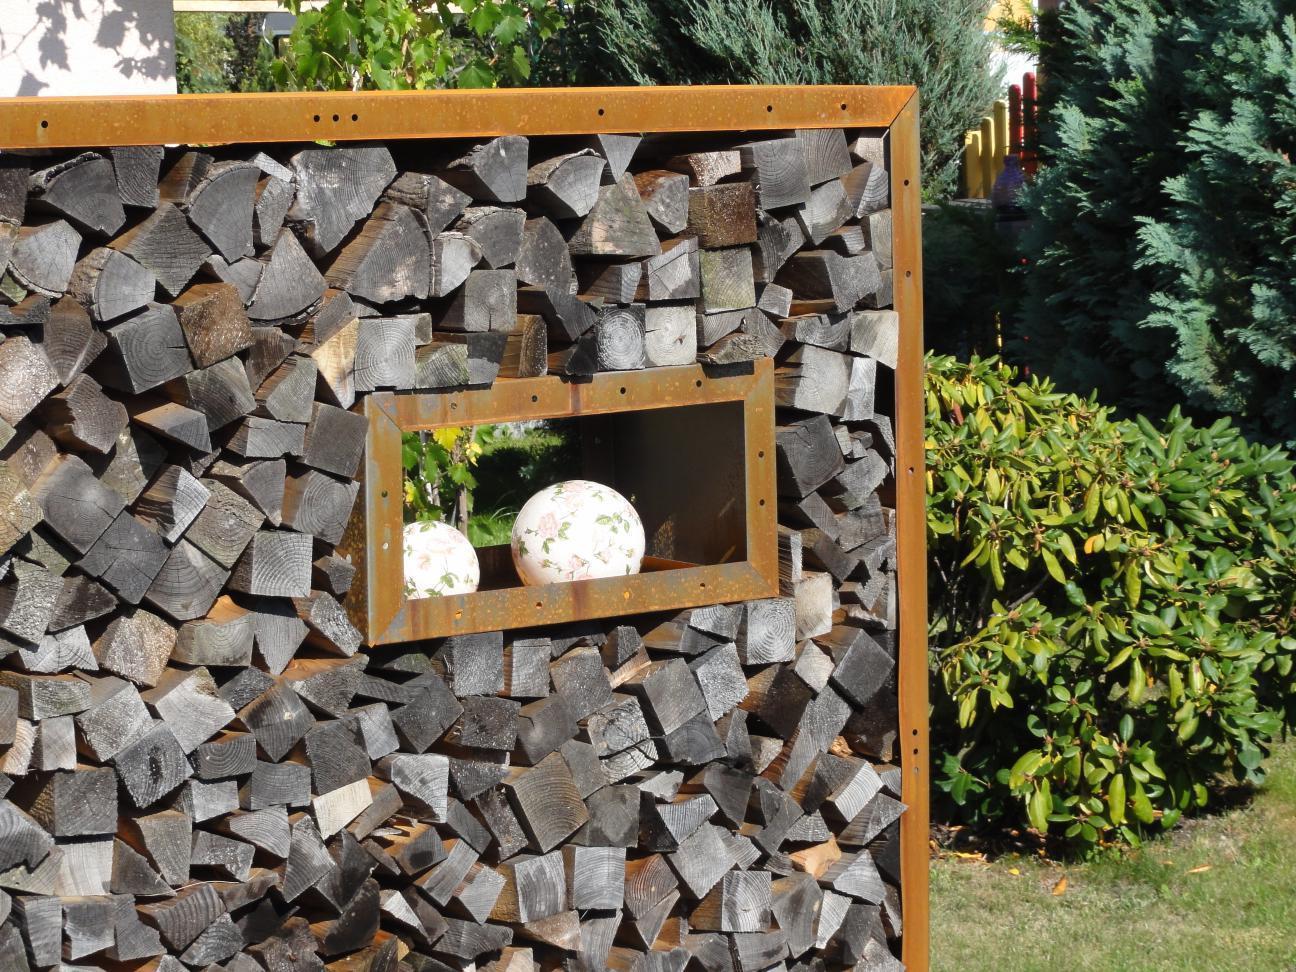 fenster kaminholzregal aus metall ohne r ckwand 0 6 x 0 3m. Black Bedroom Furniture Sets. Home Design Ideas